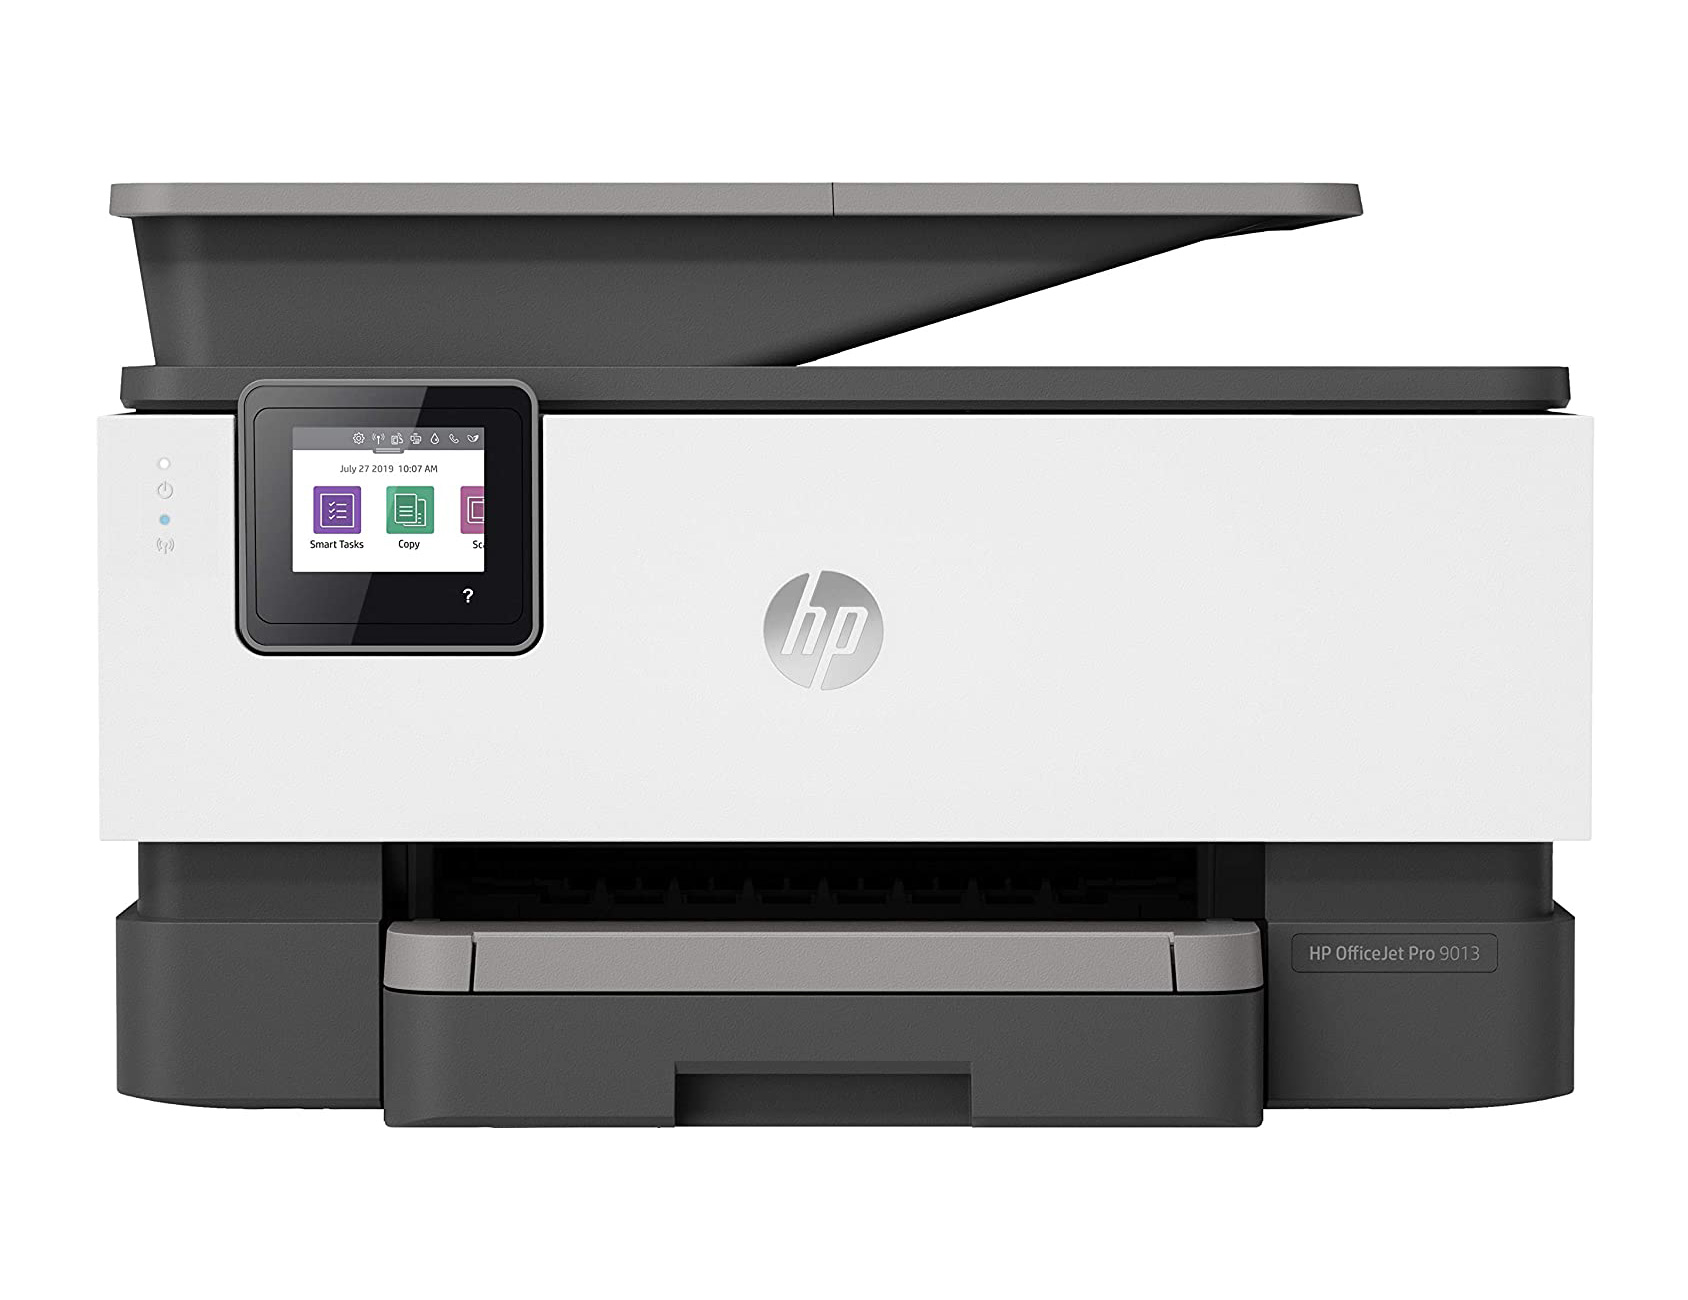 تصویر پرینتر چندکاره جوهرافشان اچ پی مدل 9013 HP OfficeJet Pro 9013 Multifunction Inkjet Printer